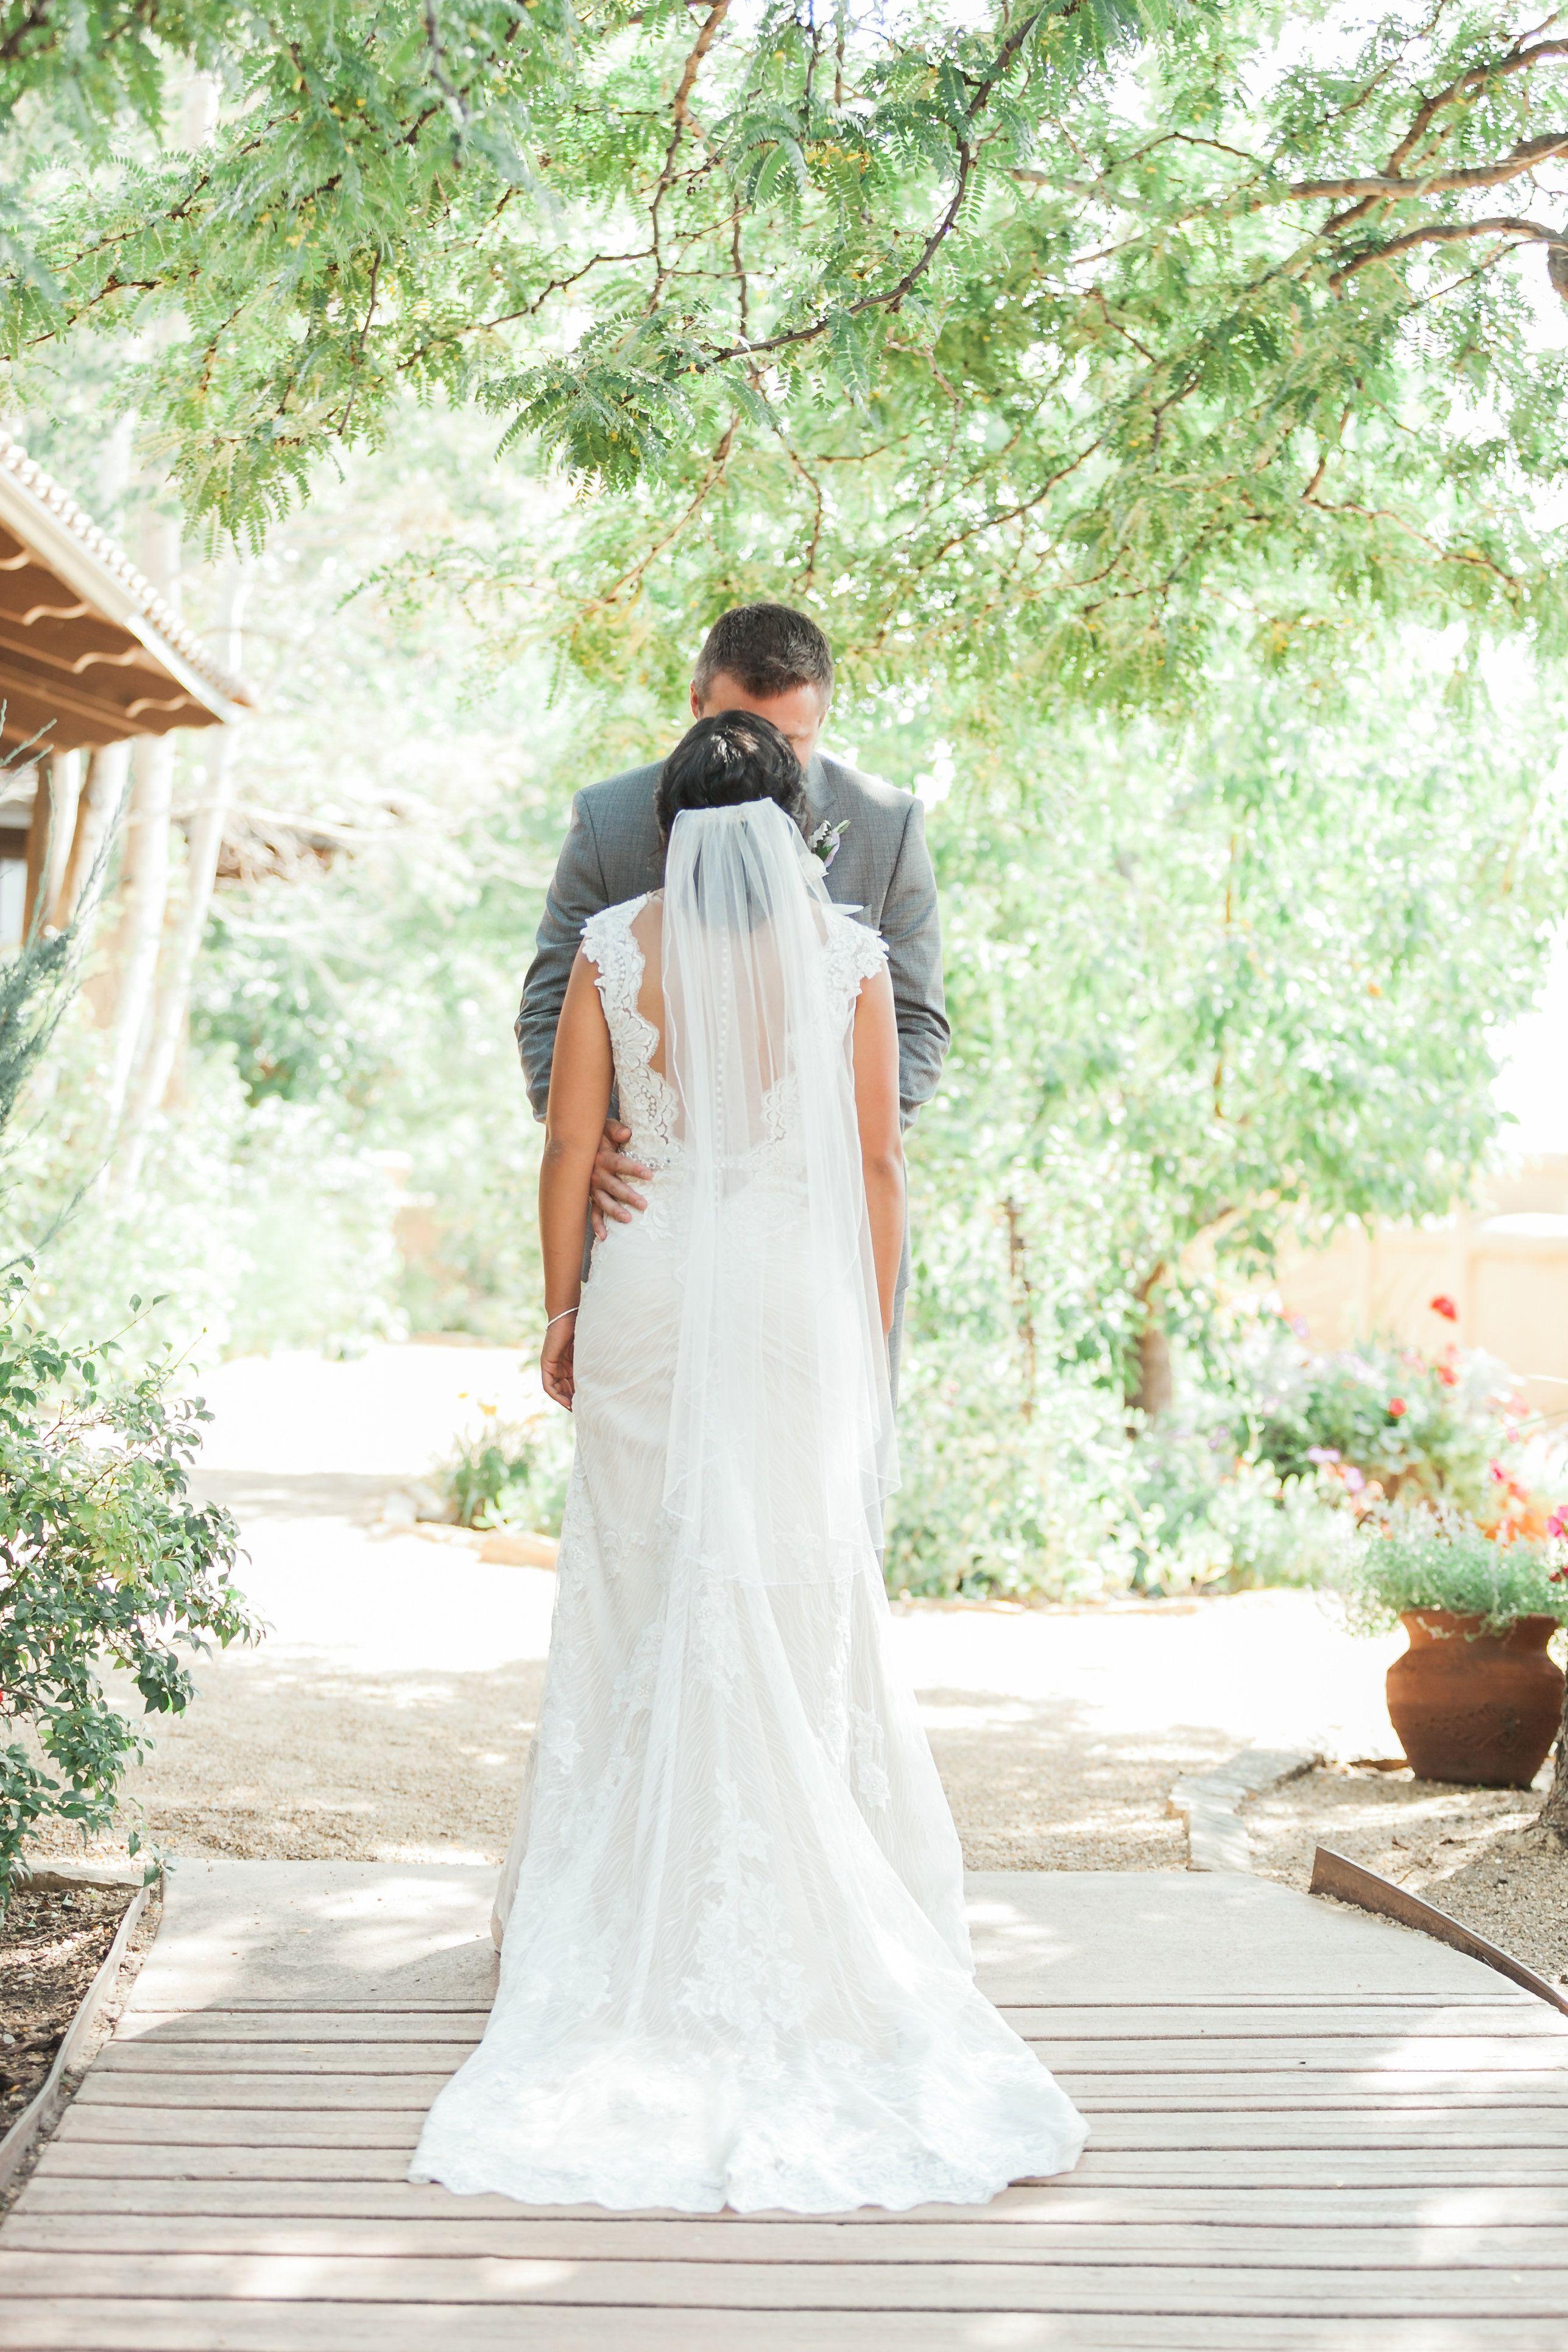 Pin on VP  wedding details 